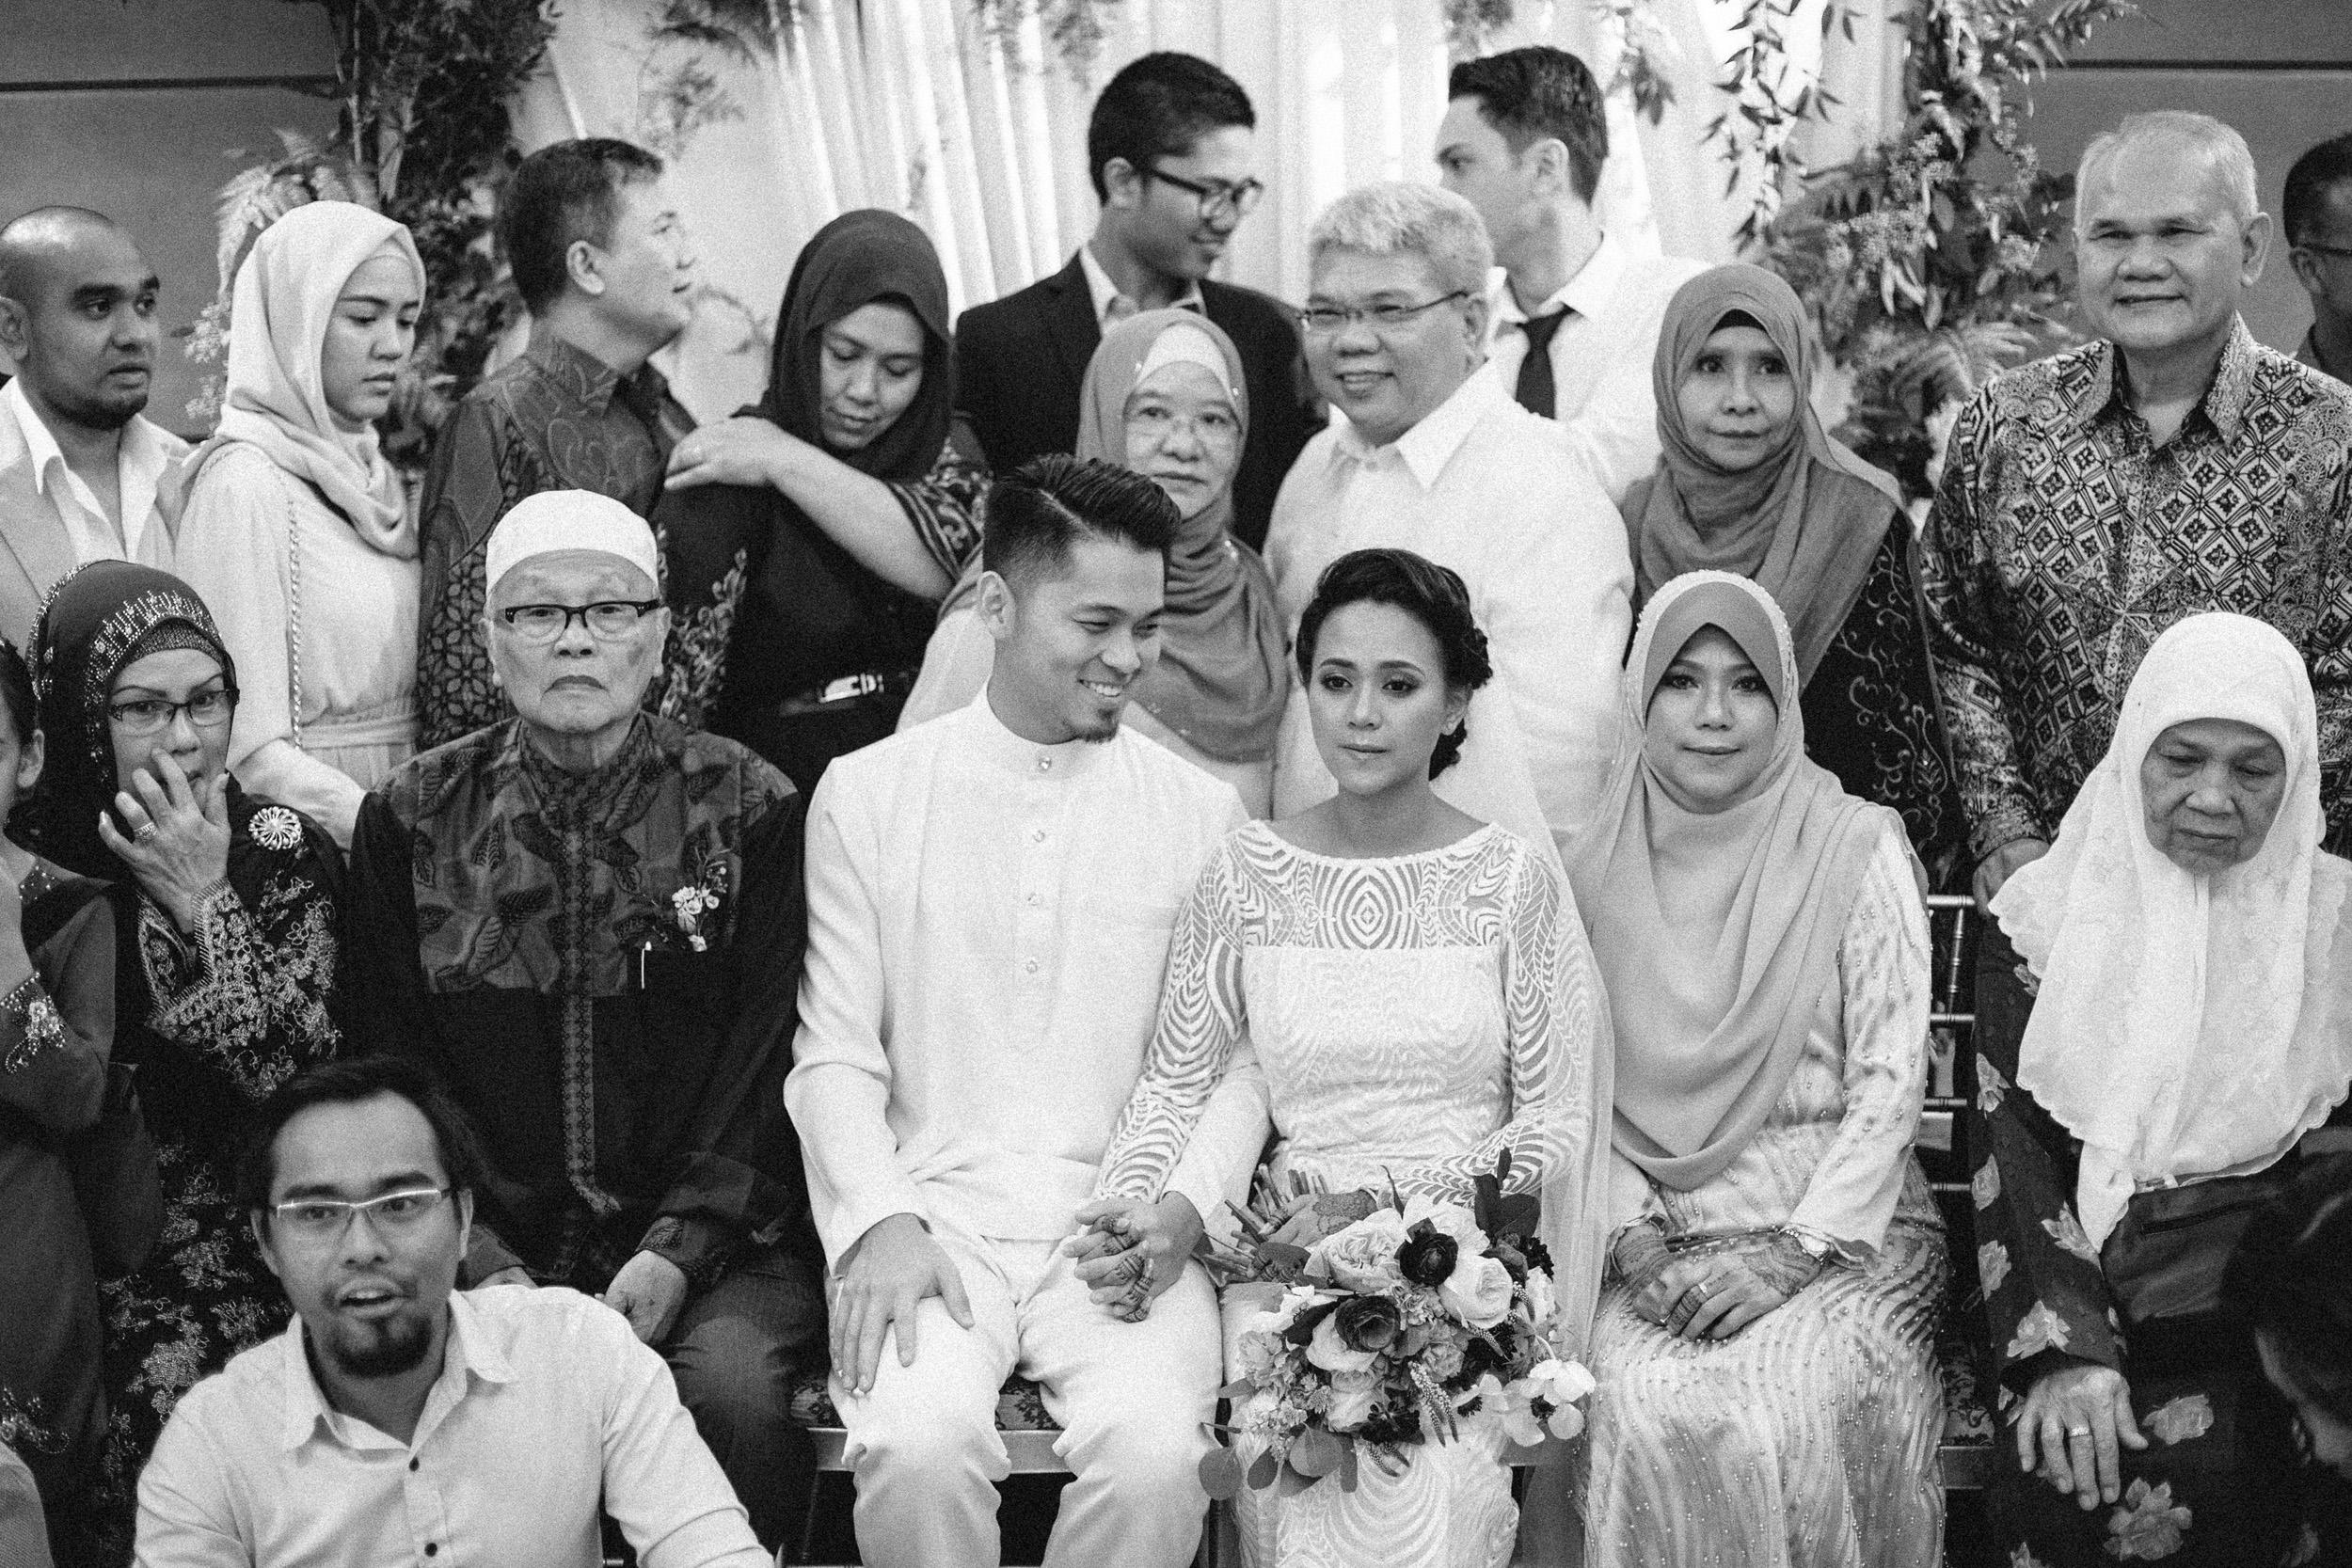 singapore-wedding-photographer-photography-wmt2017-039.jpg